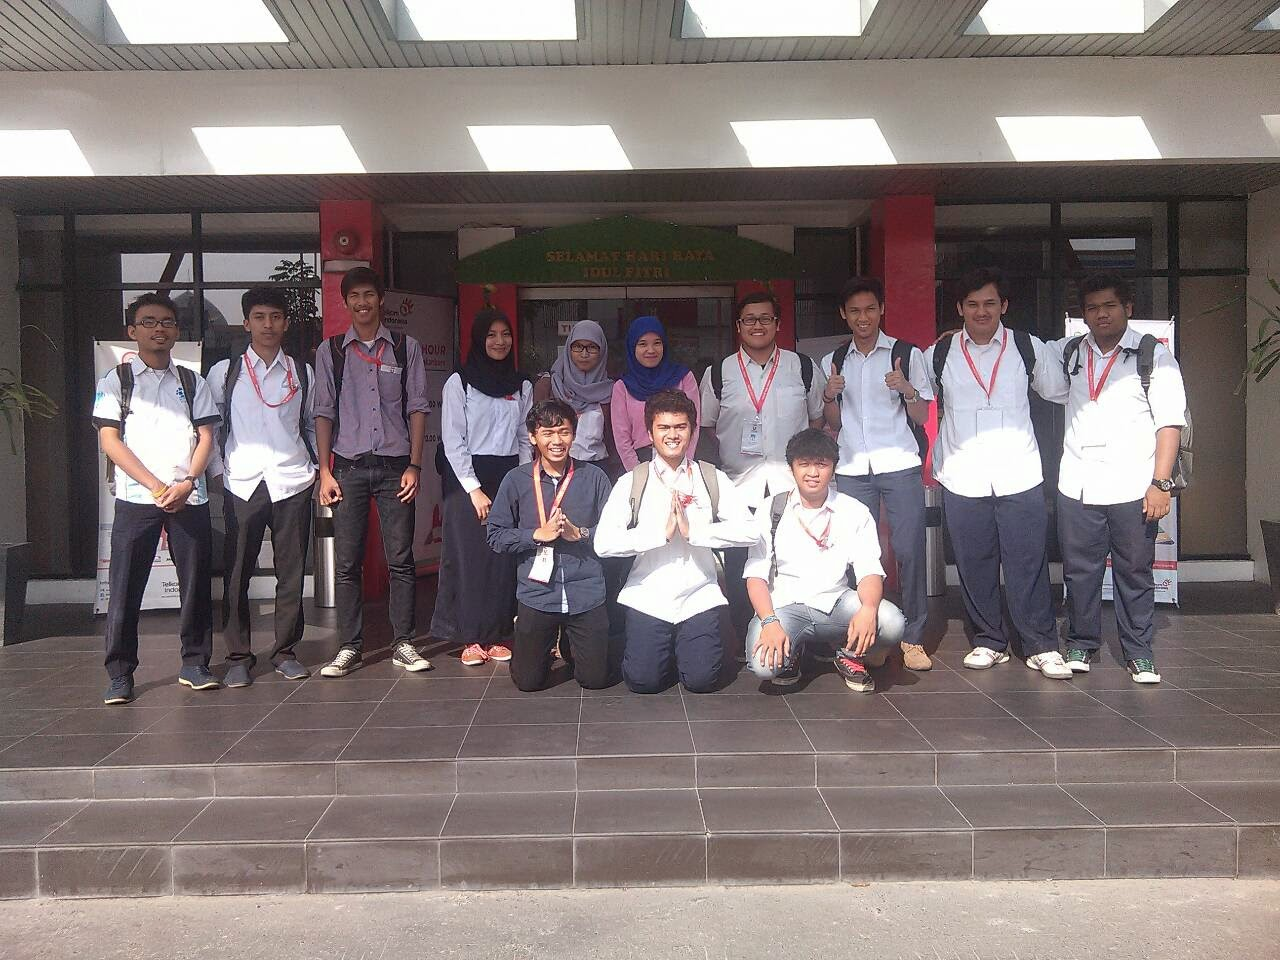 Laporan Geladi Telkom University 2014 - Muhammad Mufid Luthfi